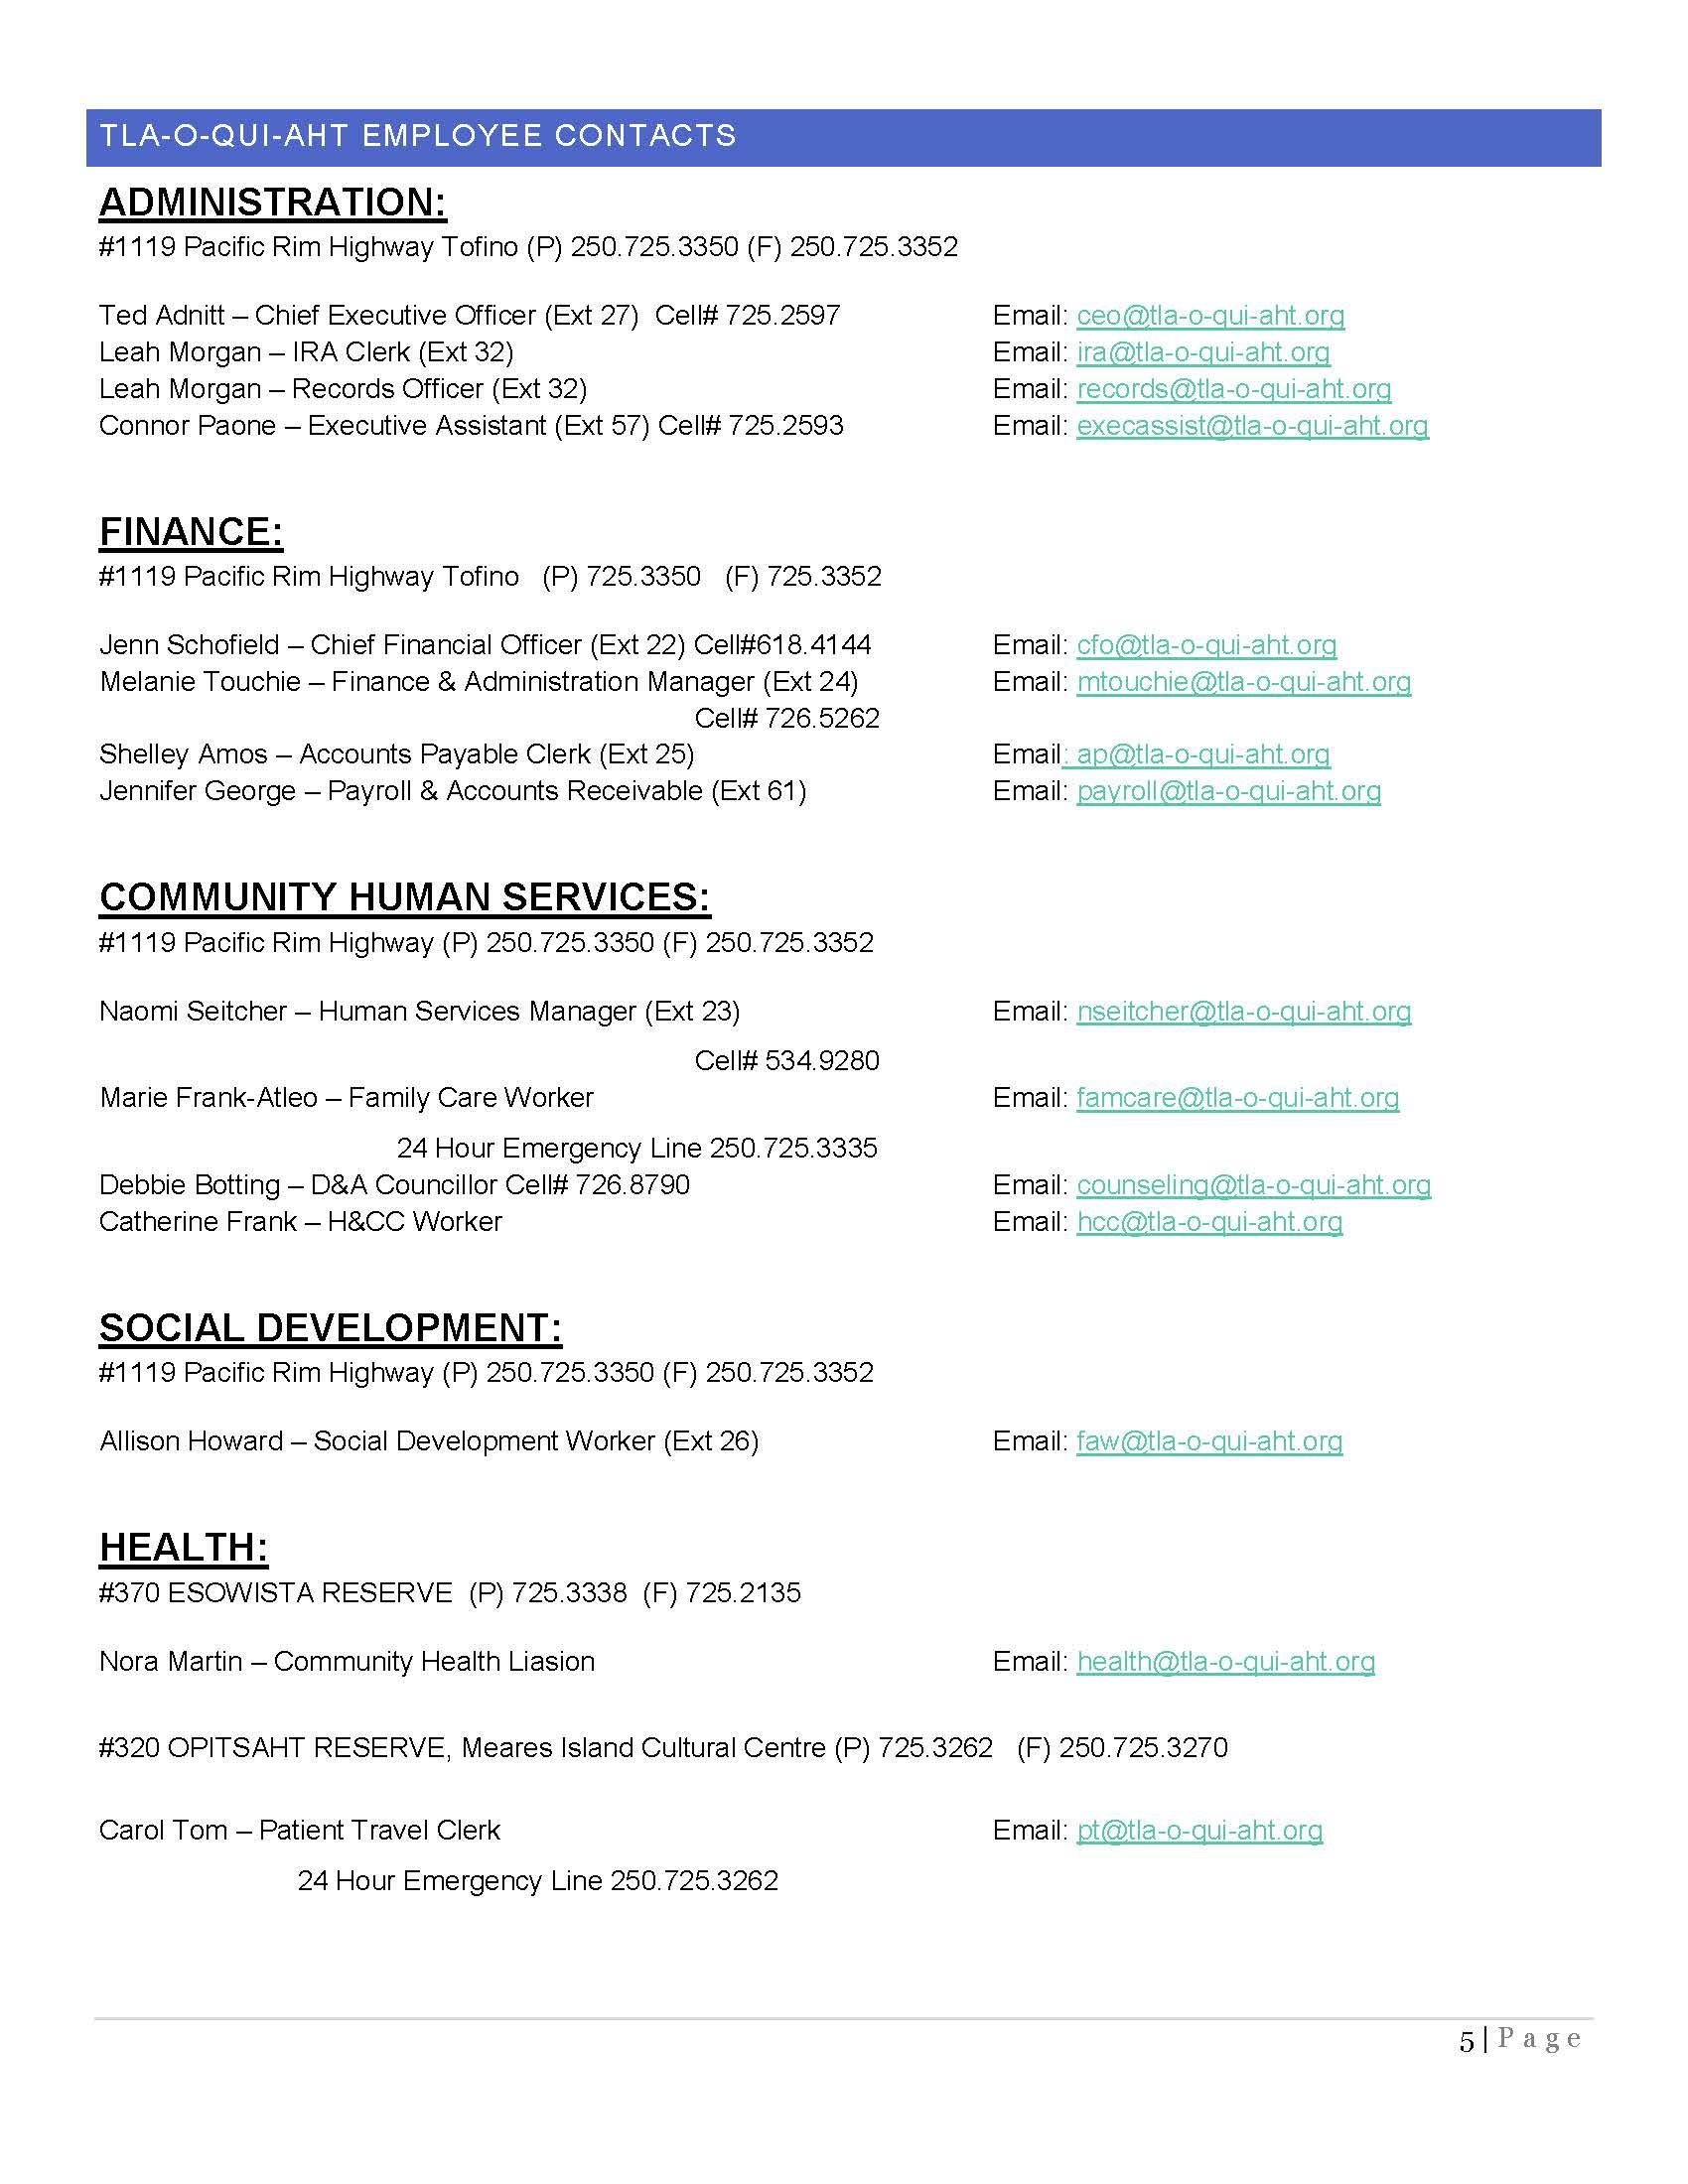 TFN Bulletin Dec 15-2016 - WEBSITE VERSION_Page_05.jpg